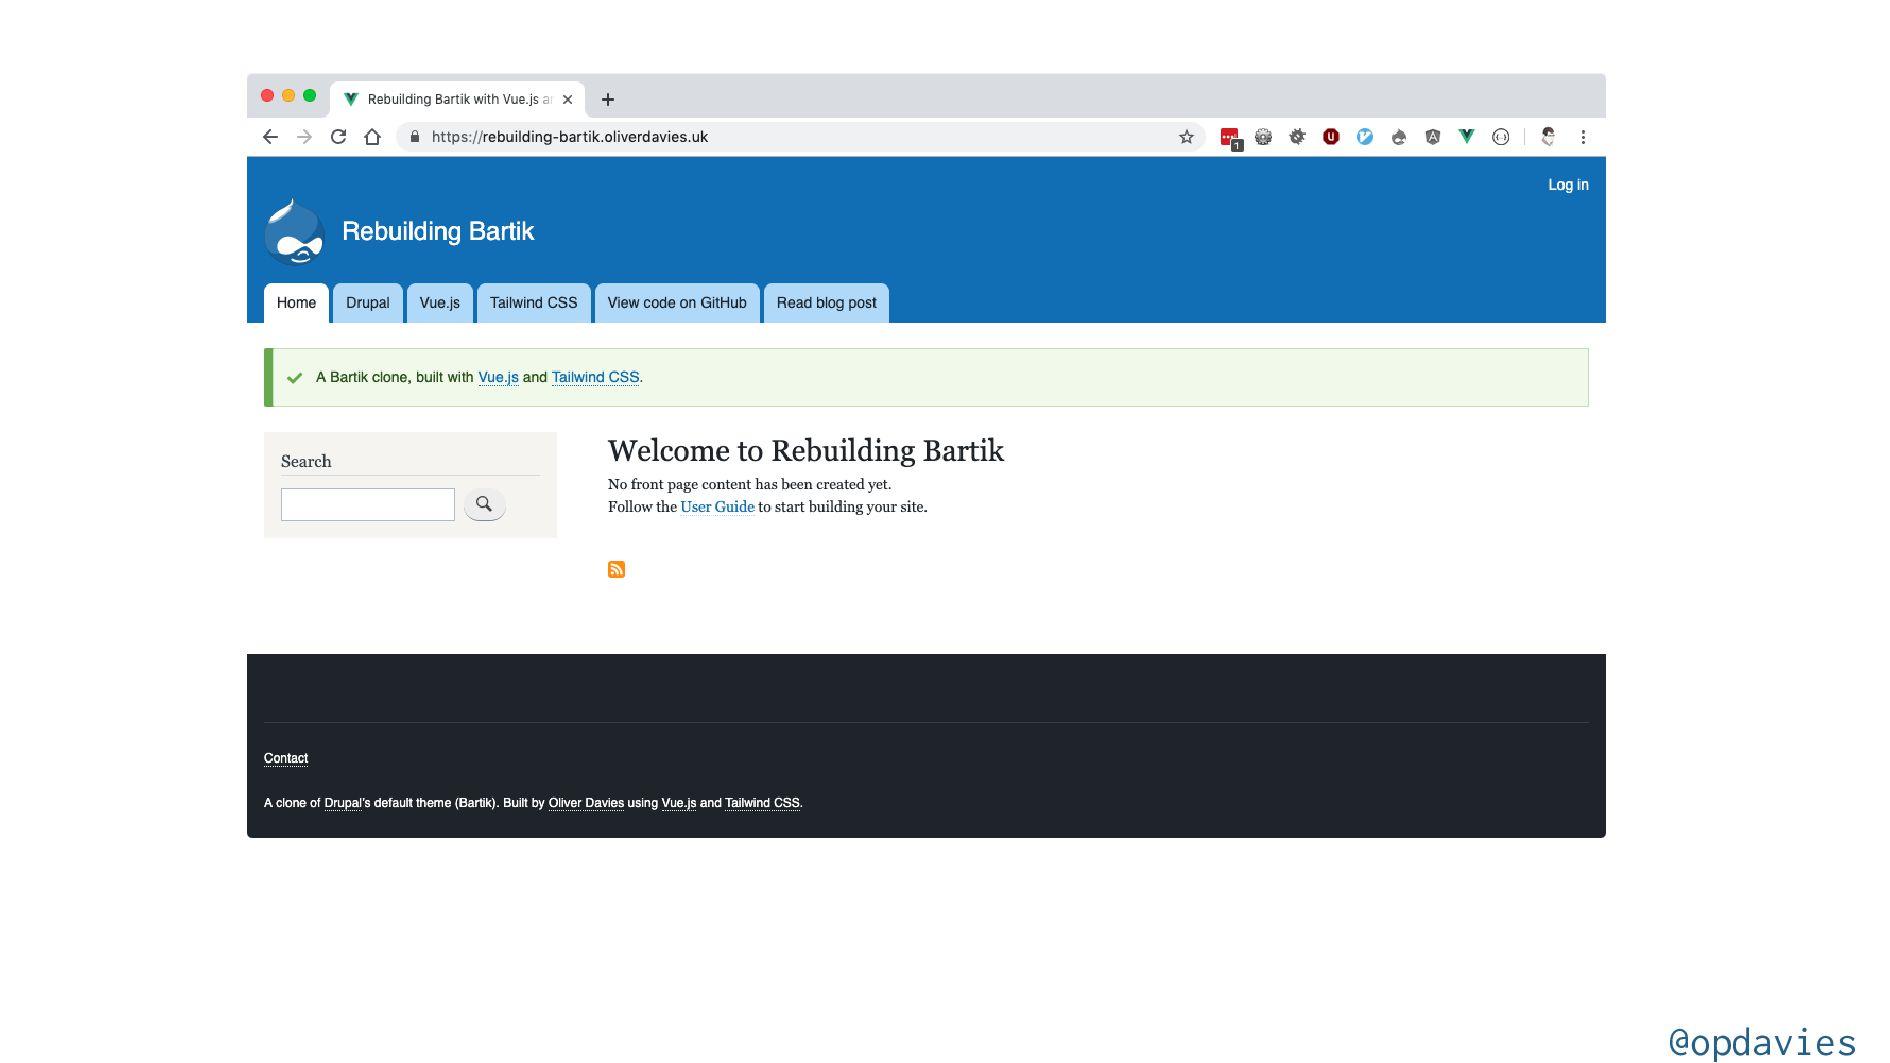 Using utility classes to build custom designs w...